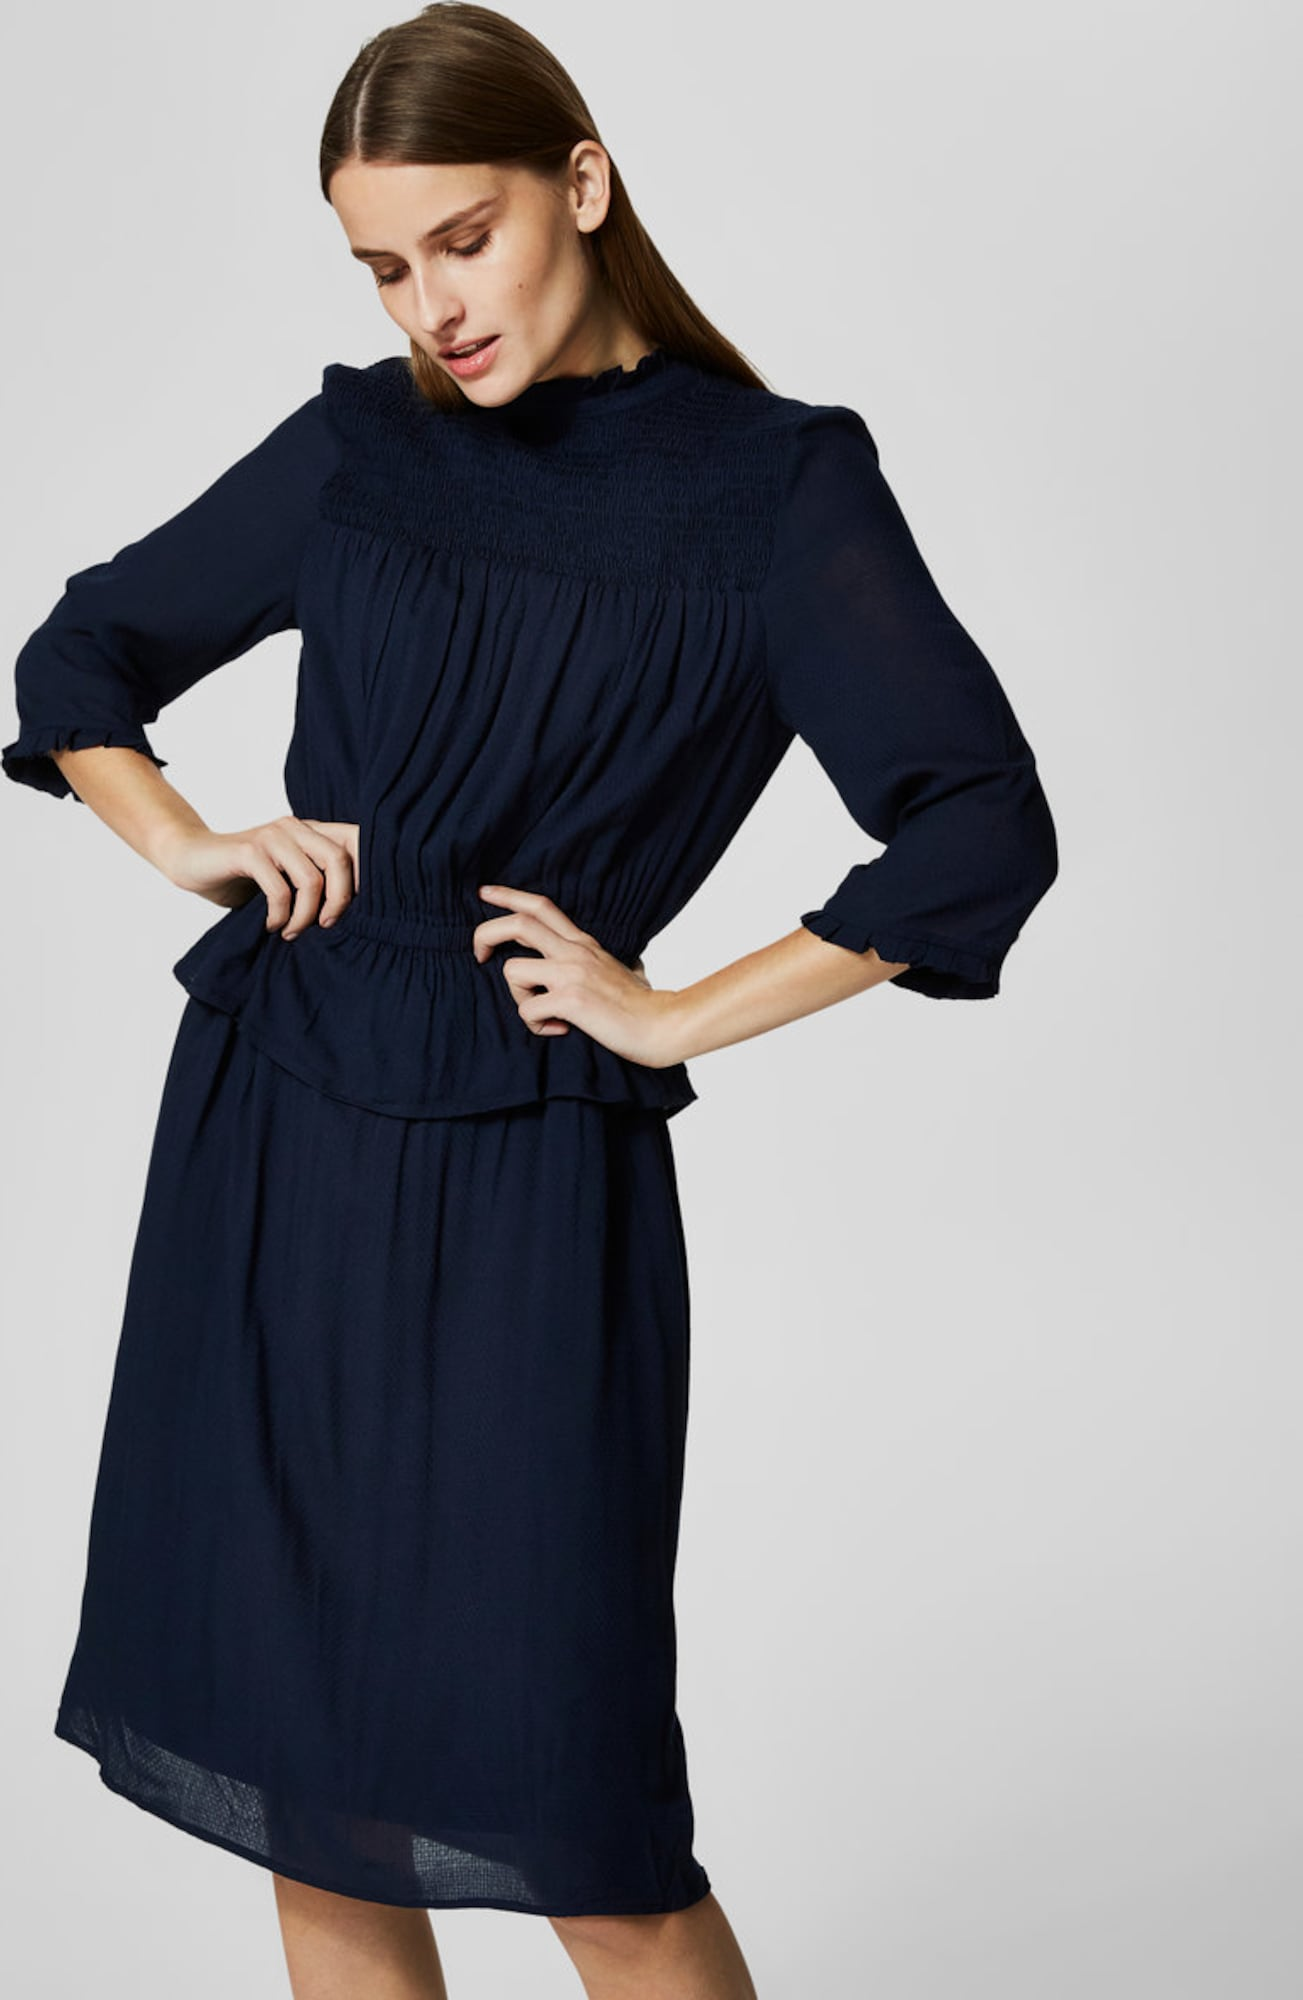 selected femme kleid mit kurzen rmeln peplum in blau. Black Bedroom Furniture Sets. Home Design Ideas